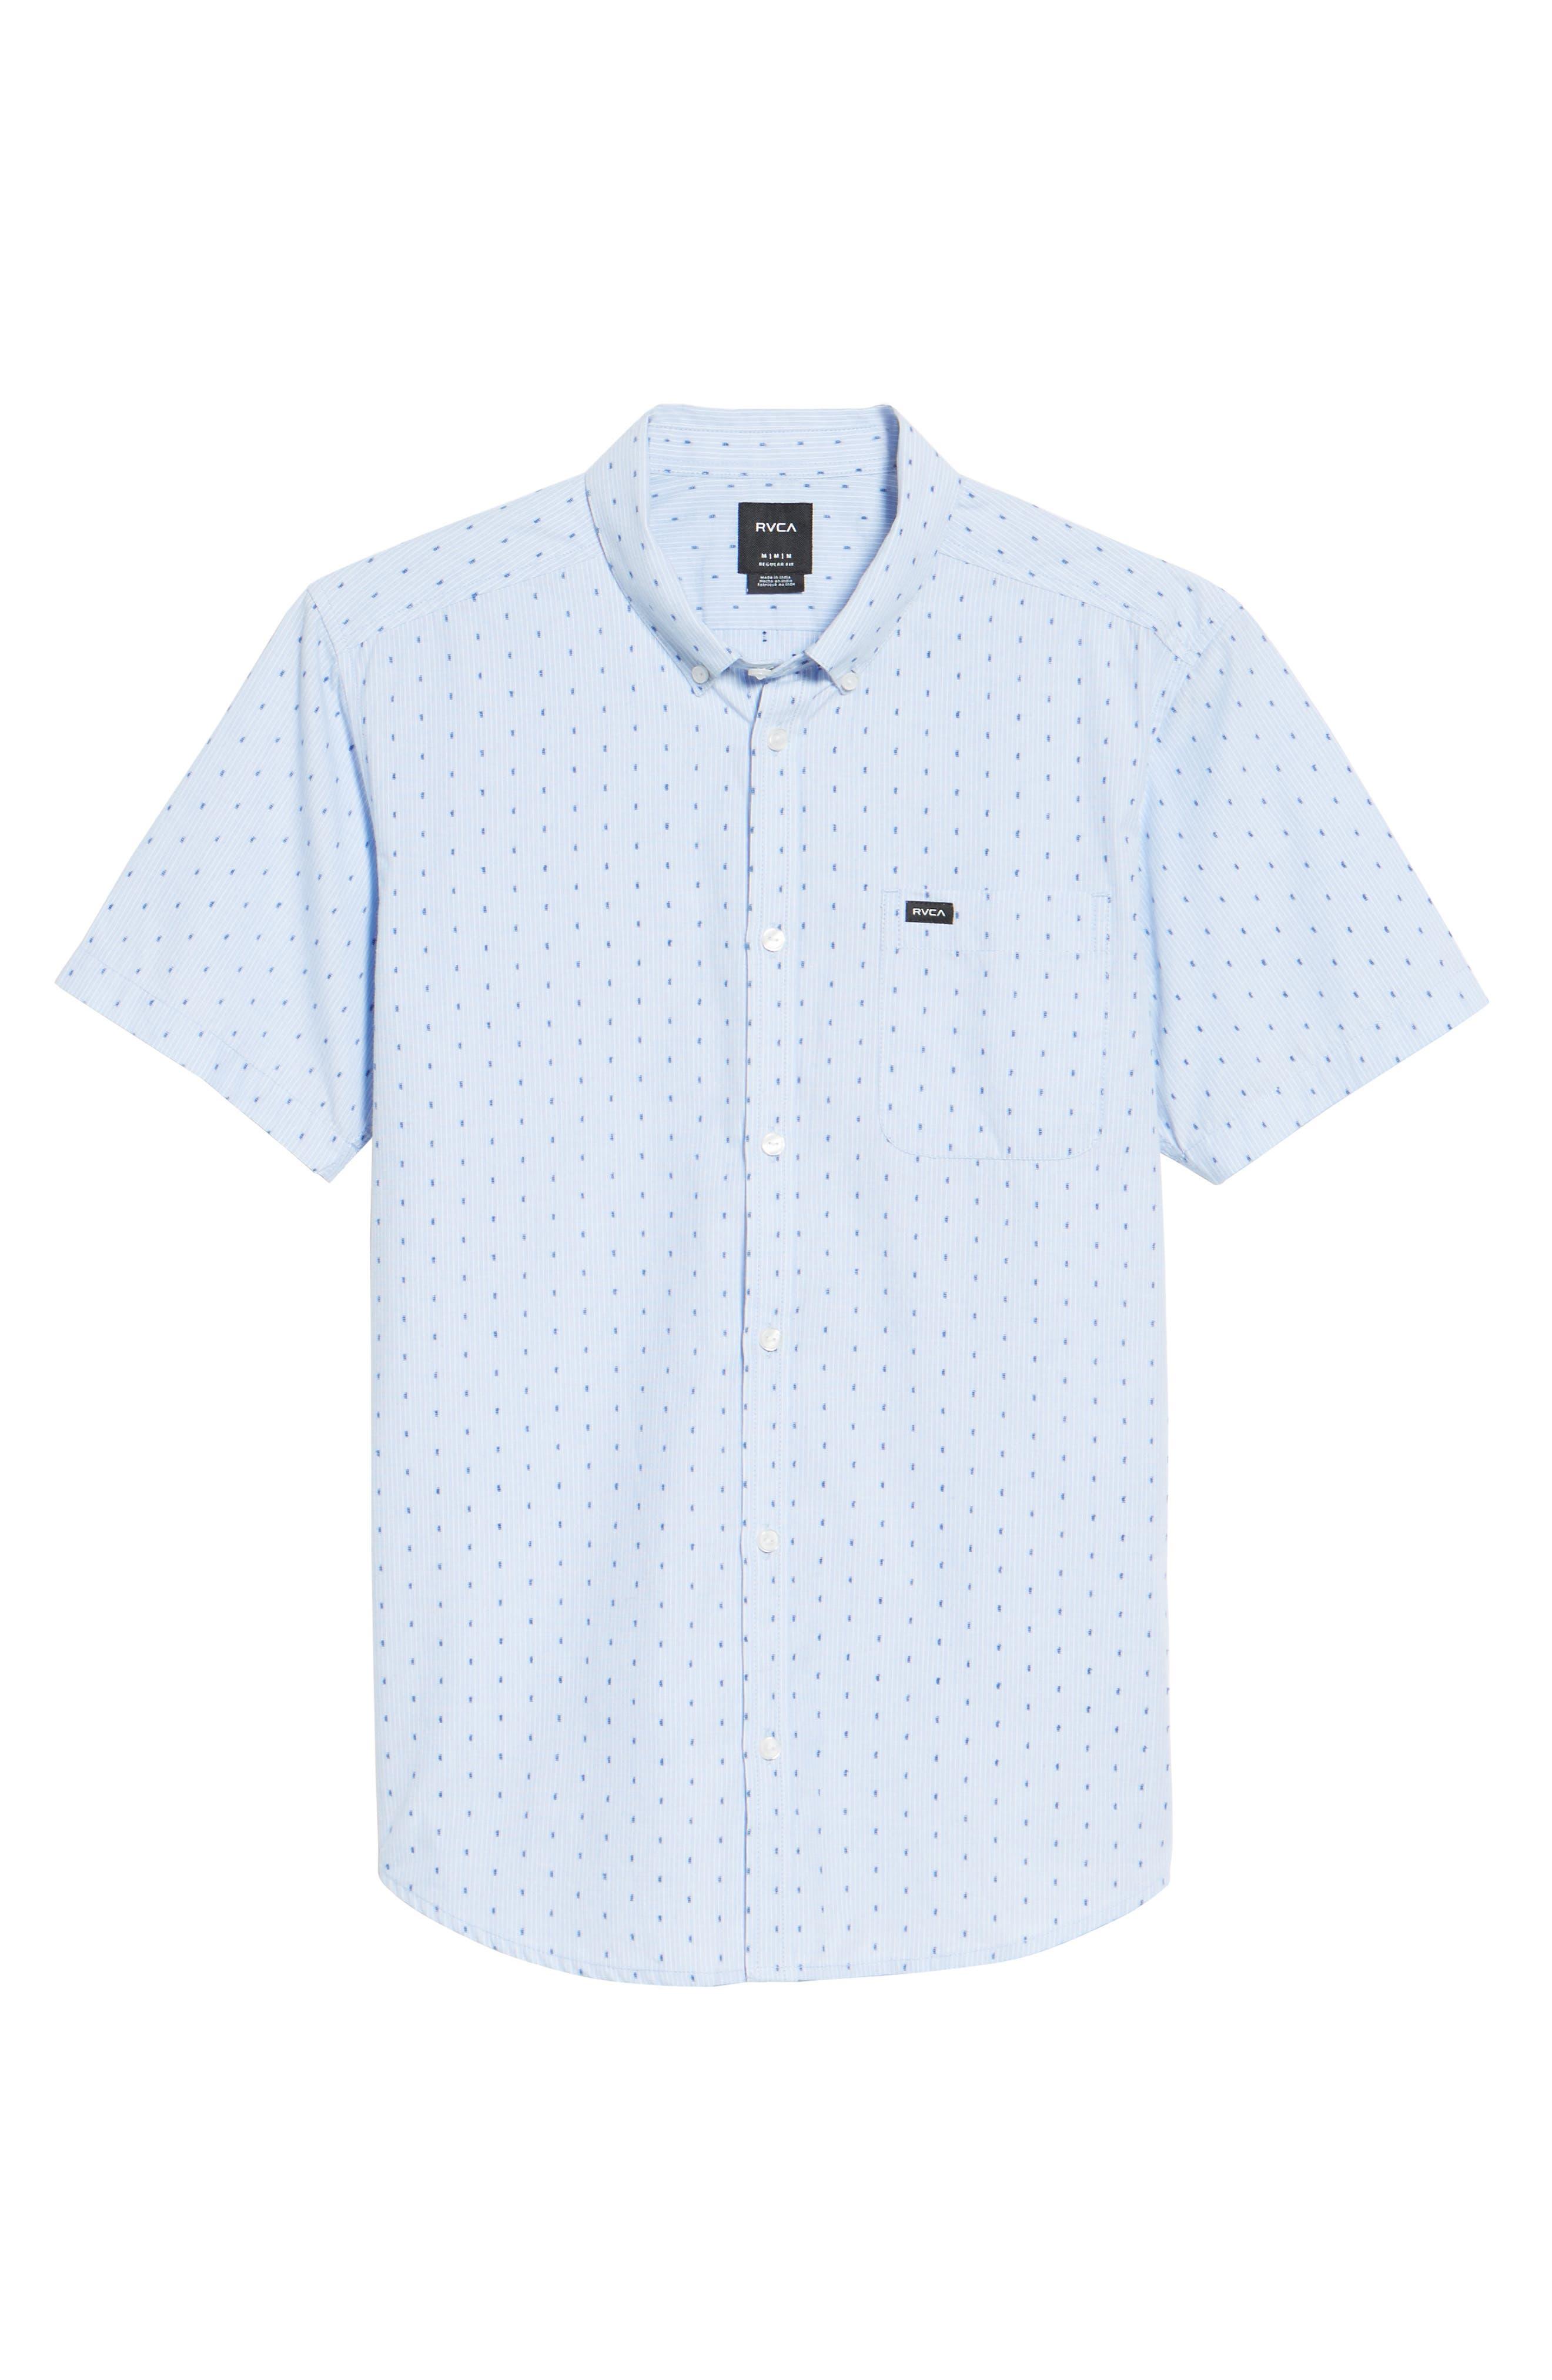 Main Image - RVCA Return Dobby Woven Shirt